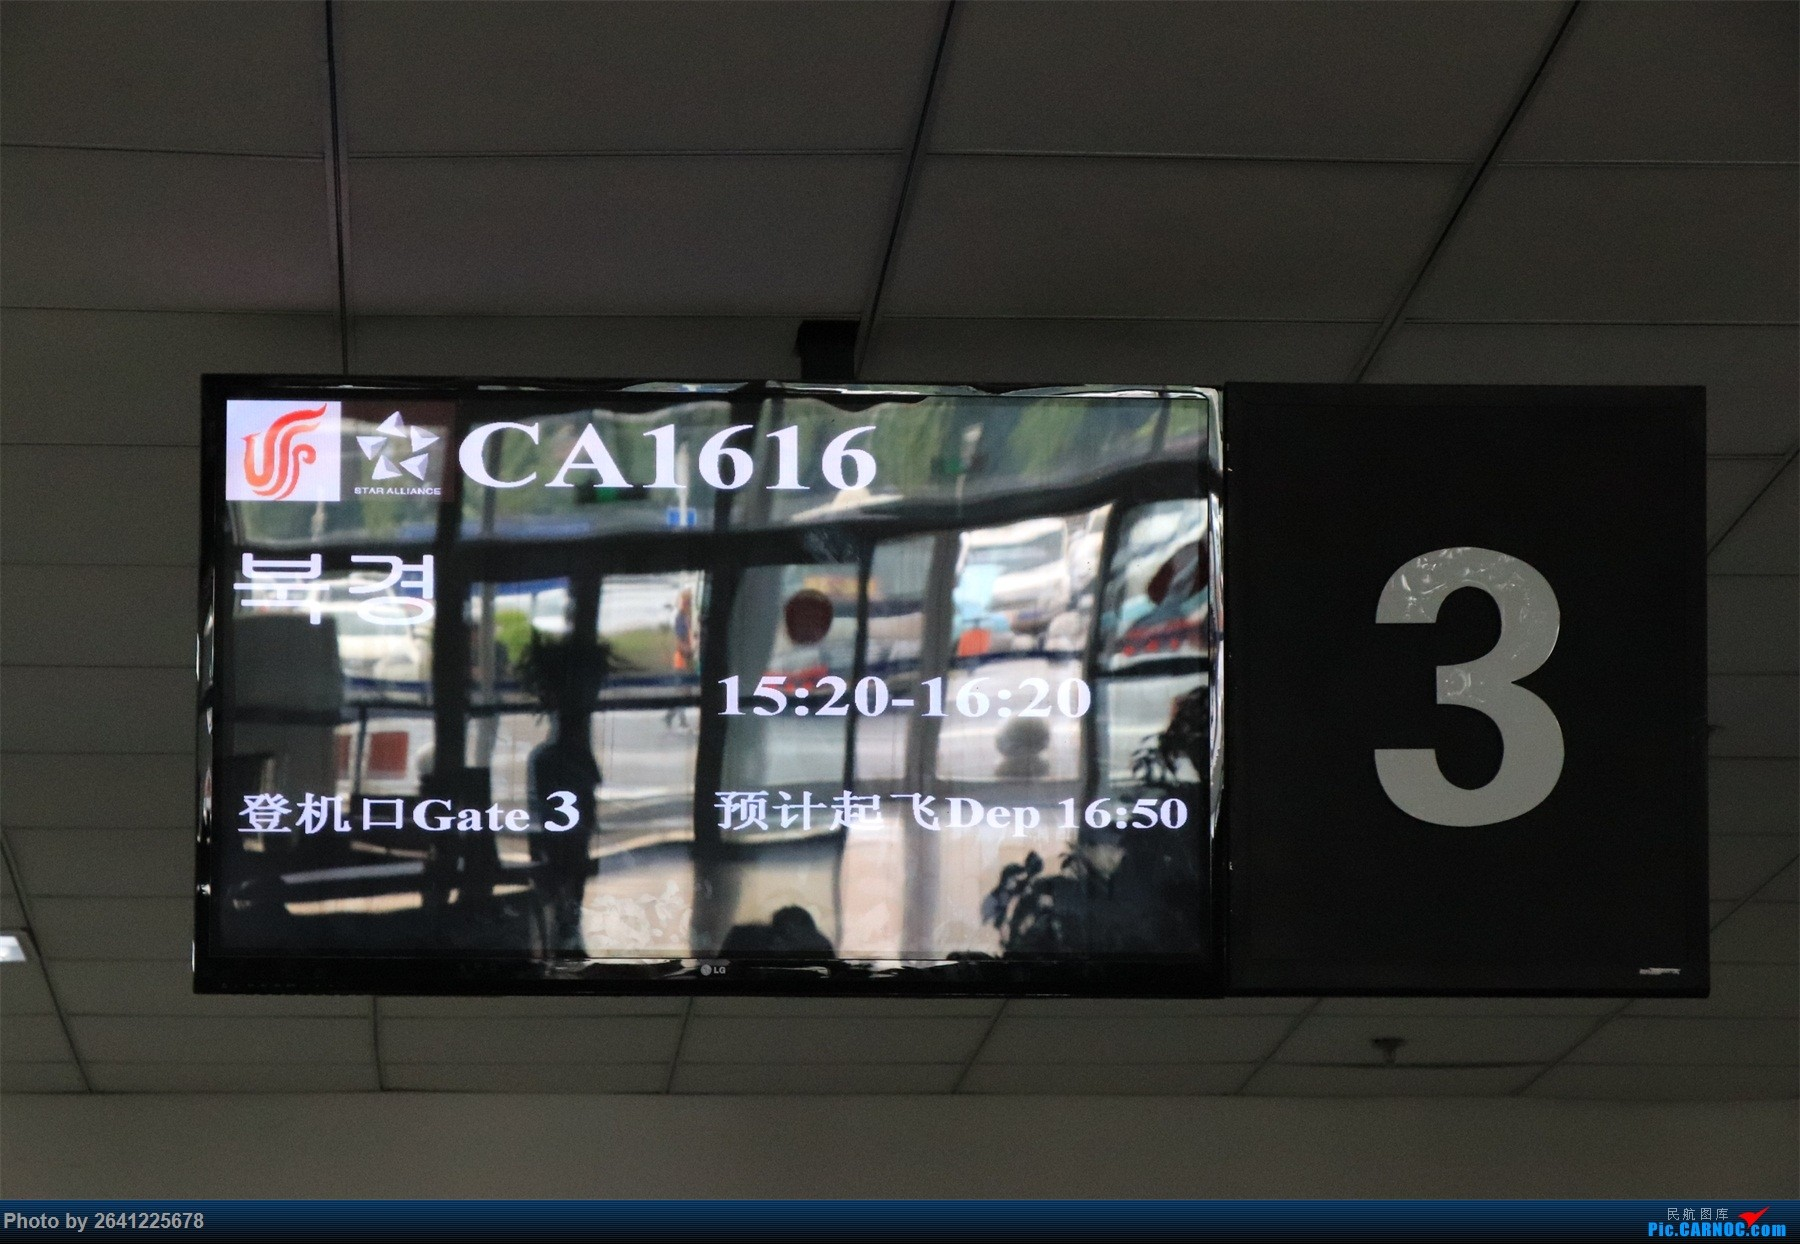 Re:[原创]【和小周飞拍世界第4集】空铁联运回家乡,长白延边好风光(家庭出游+探亲吉林6日游)*****更新至延吉部分,有FLIGHT LOG*****    中国延吉朝阳川国际机场